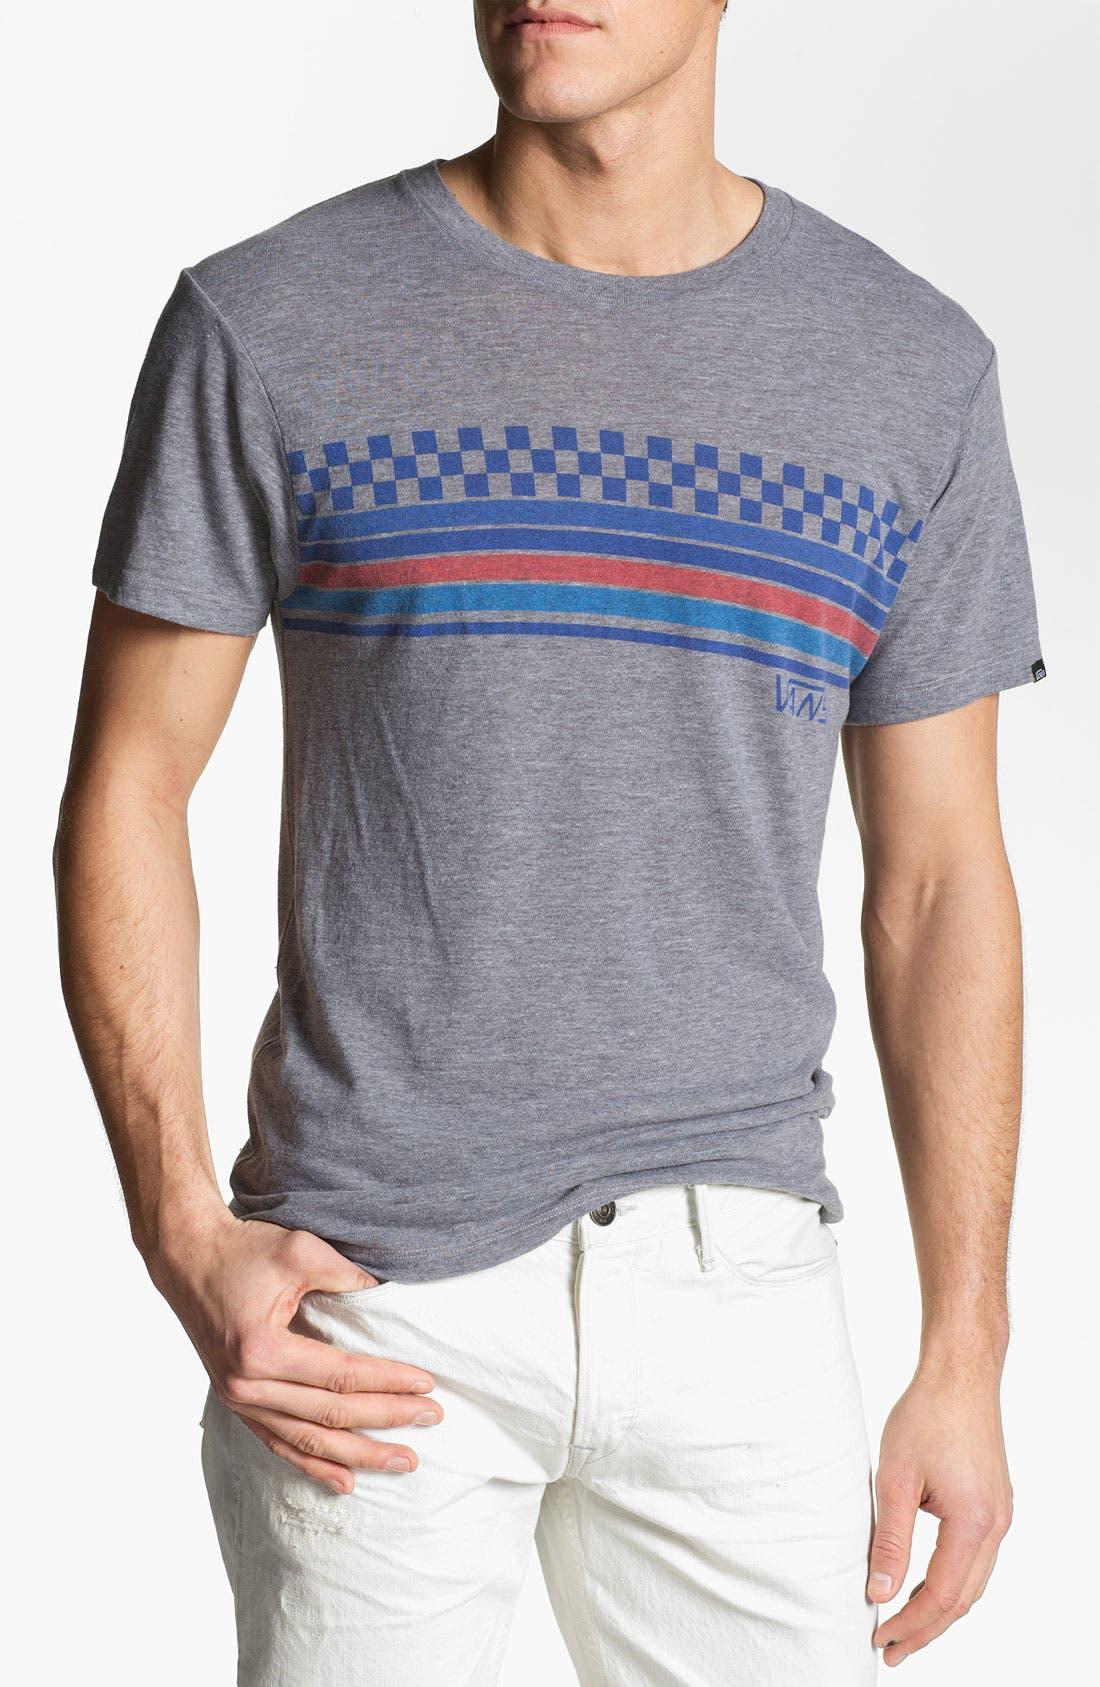 Main Image - Vans 'Pista' T-Shirt